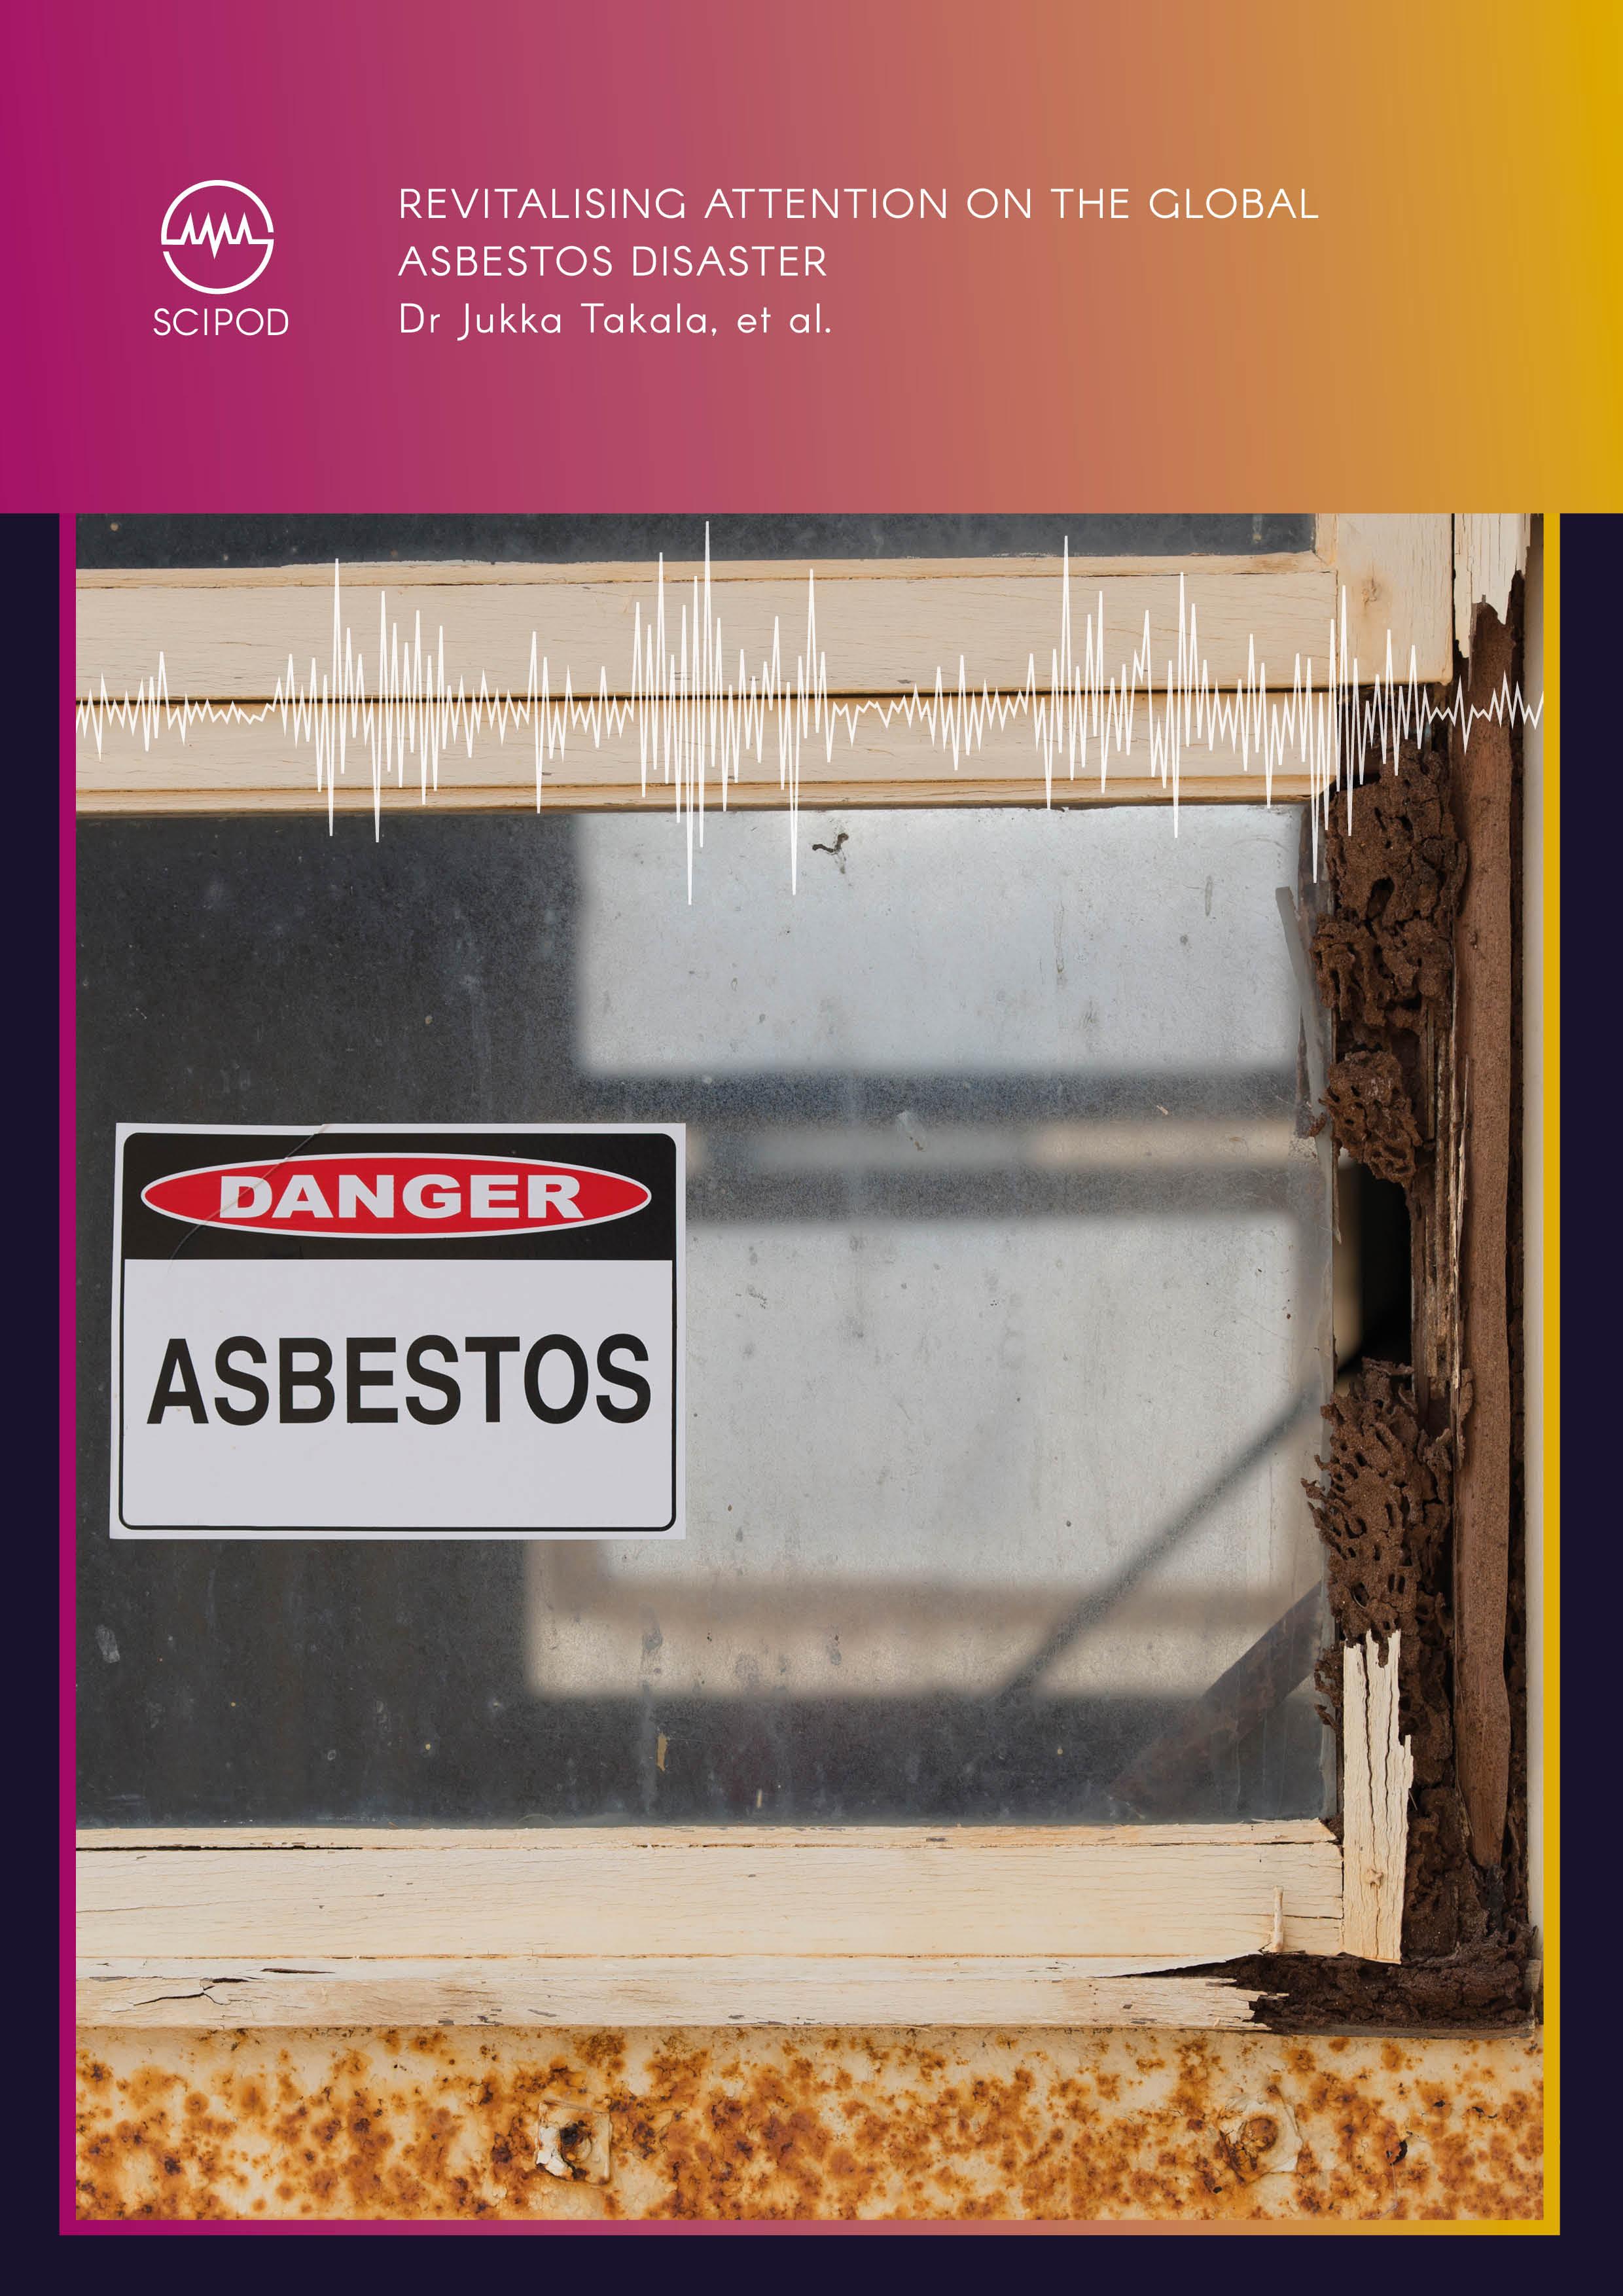 Revitalising Attention on the Global Asbestos Disaster – Dr Jukka Takala, et al.